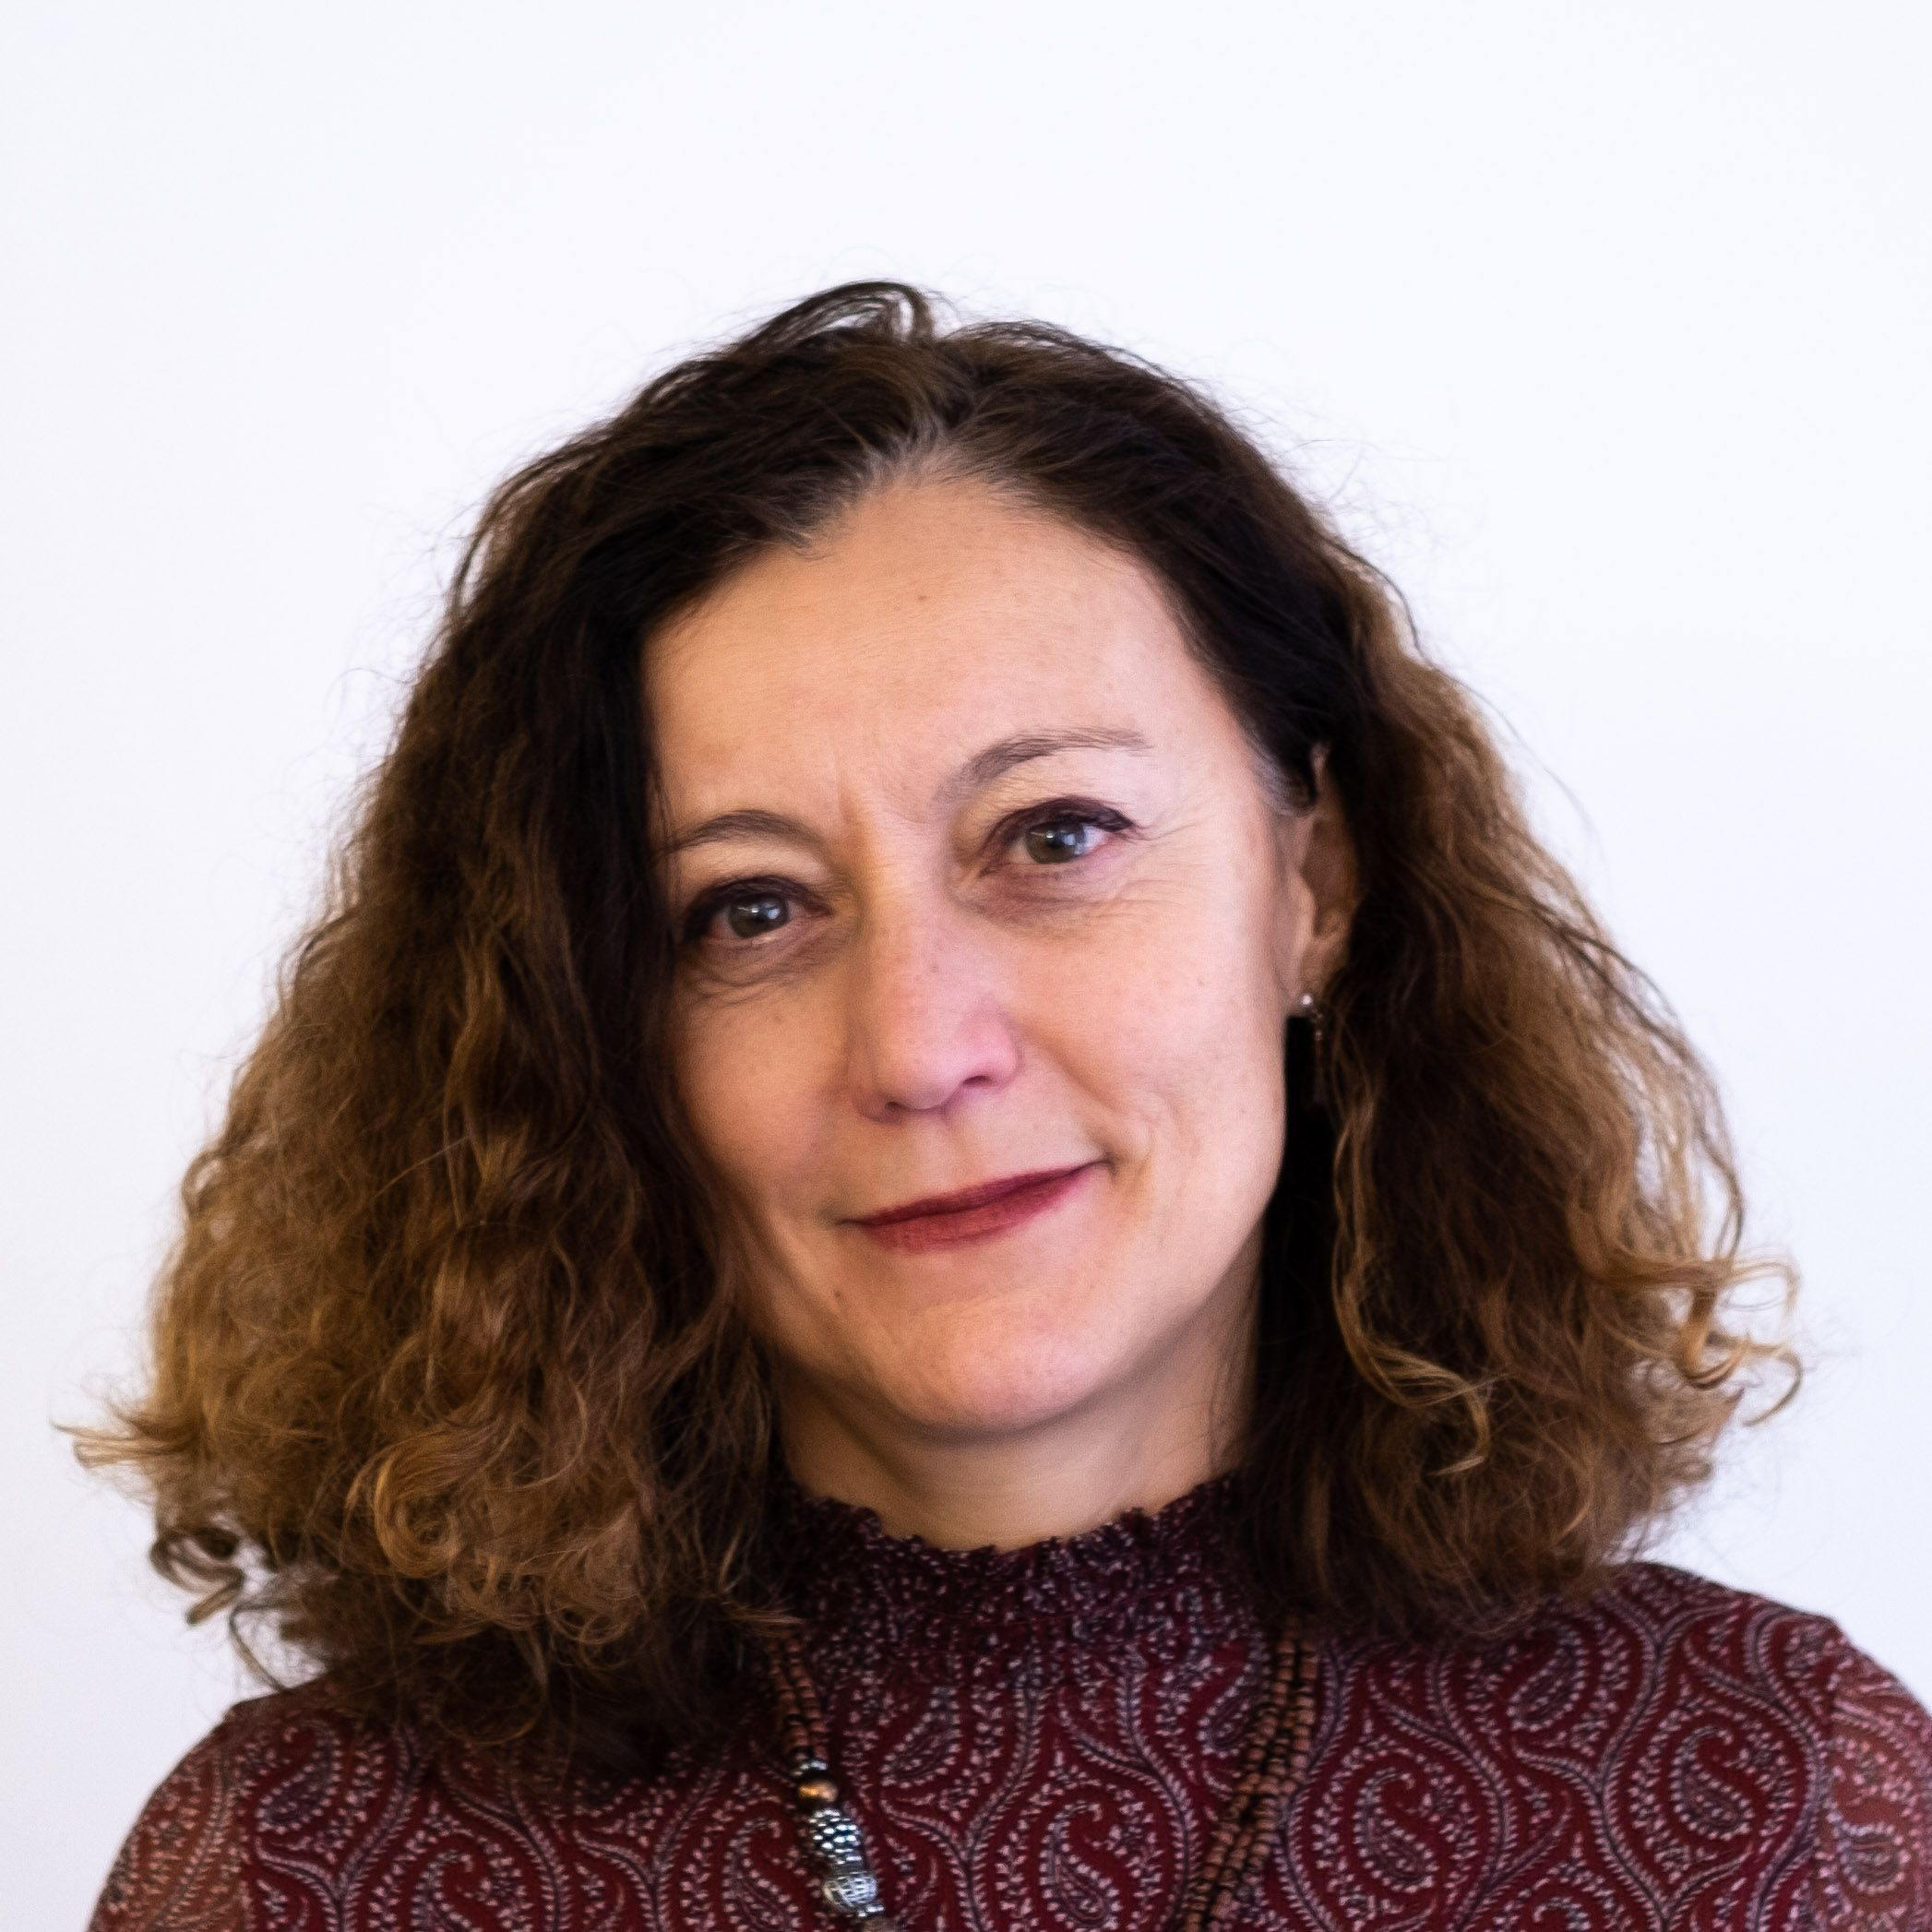 Irma Castoldi